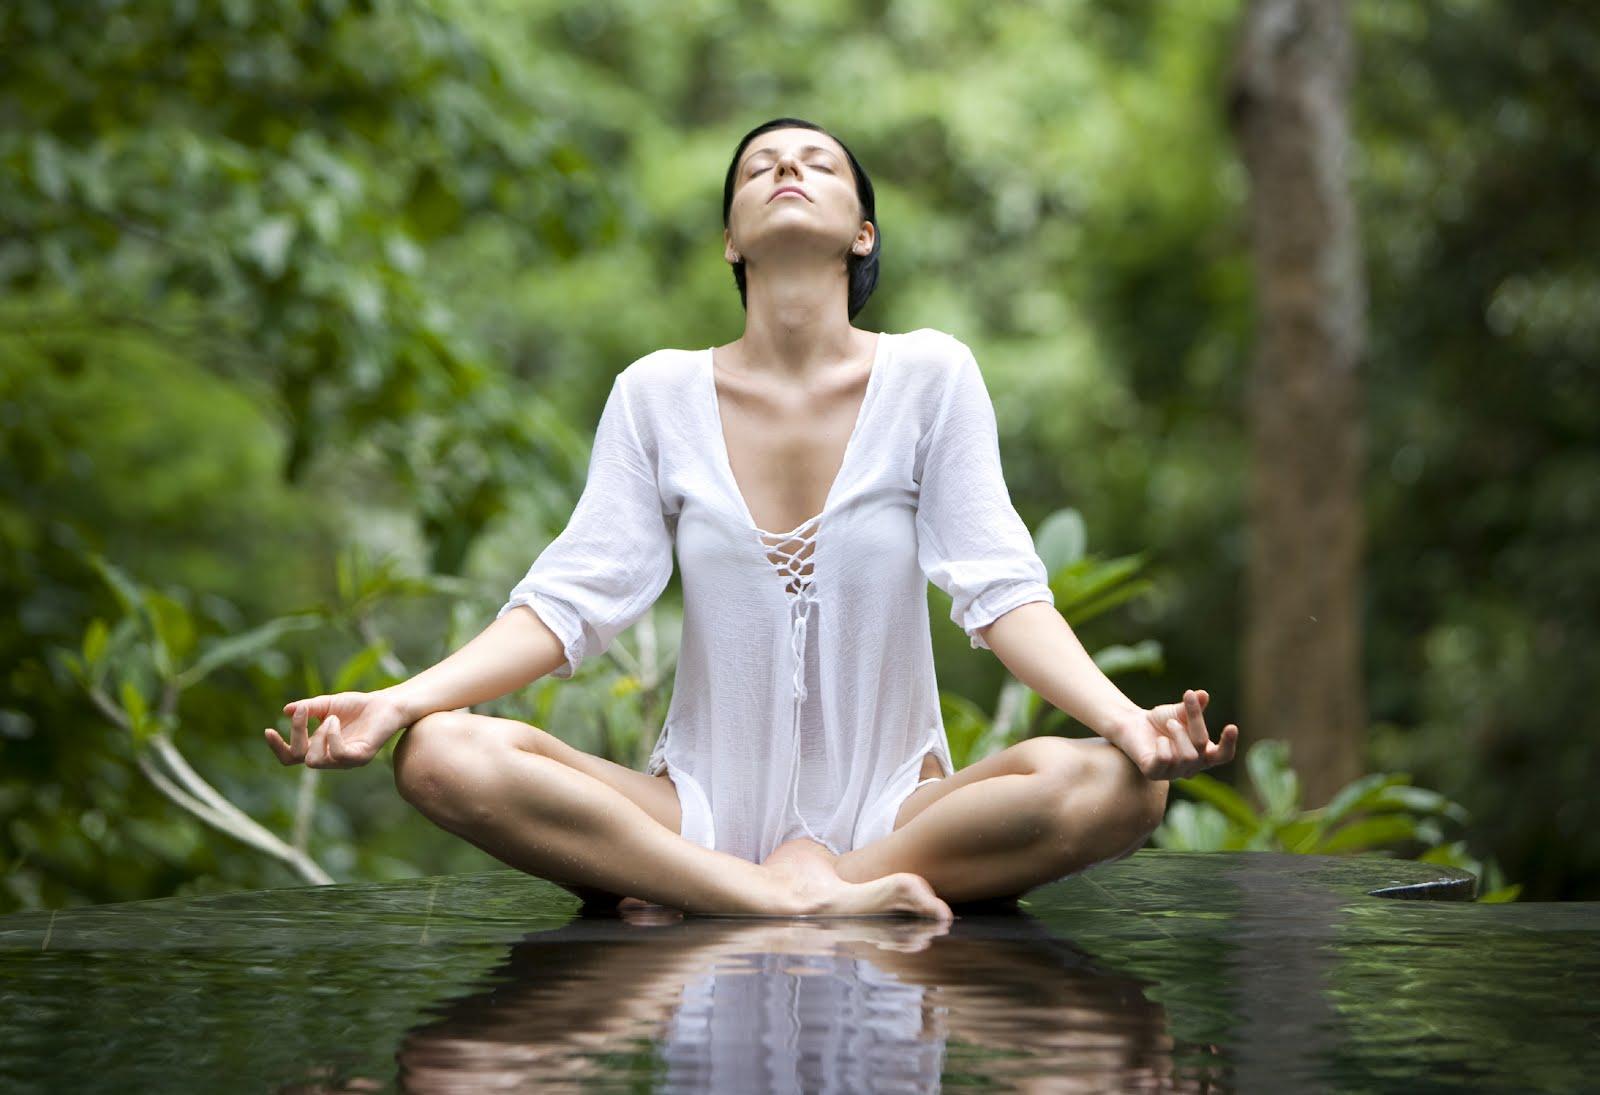 Come dimagrire con lo yoga